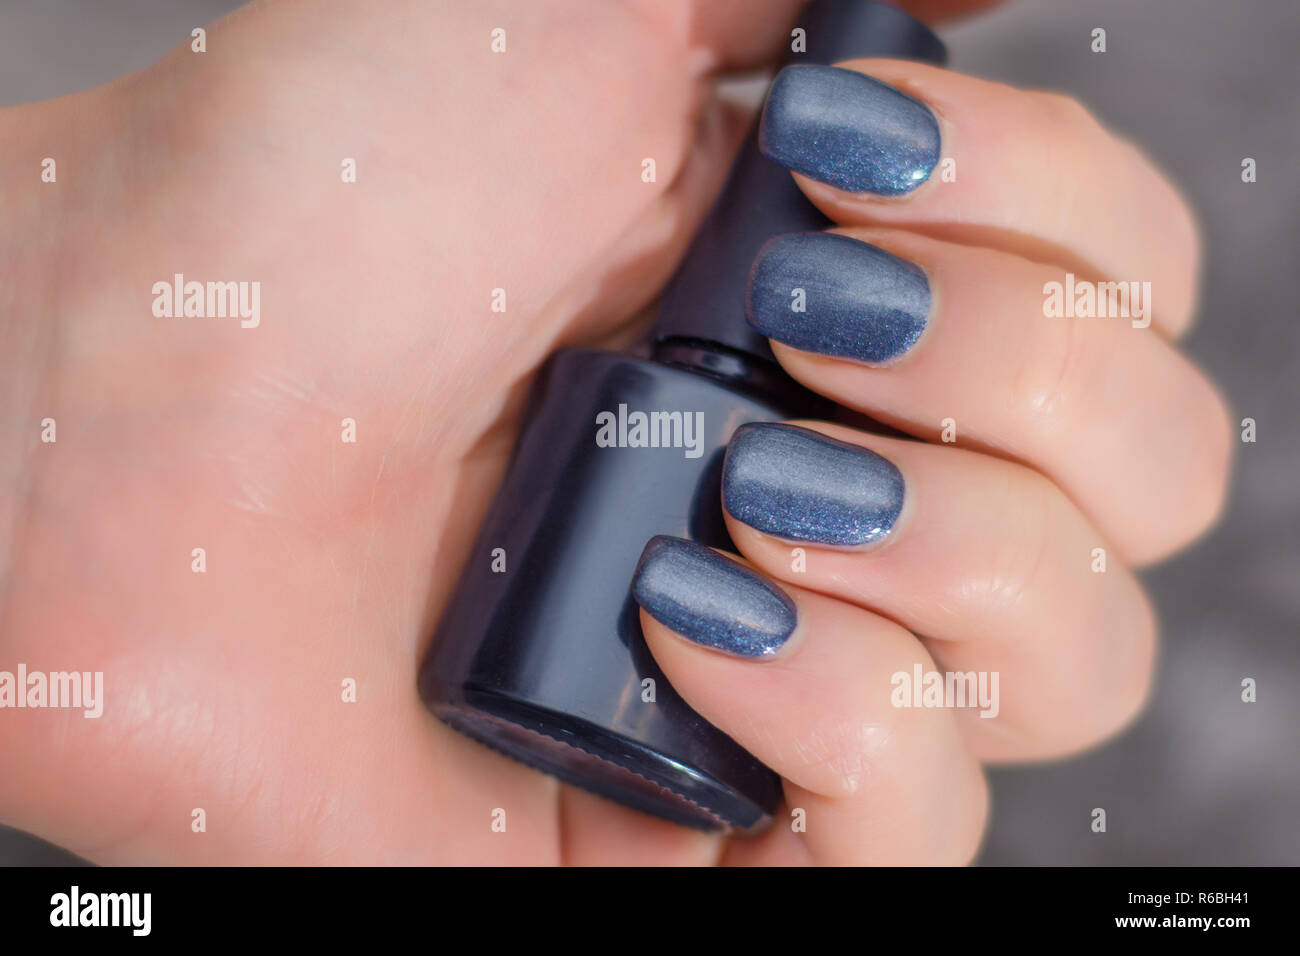 Lado Femenino Con Azul Marino Manicura Con Dedos Sosteniendo